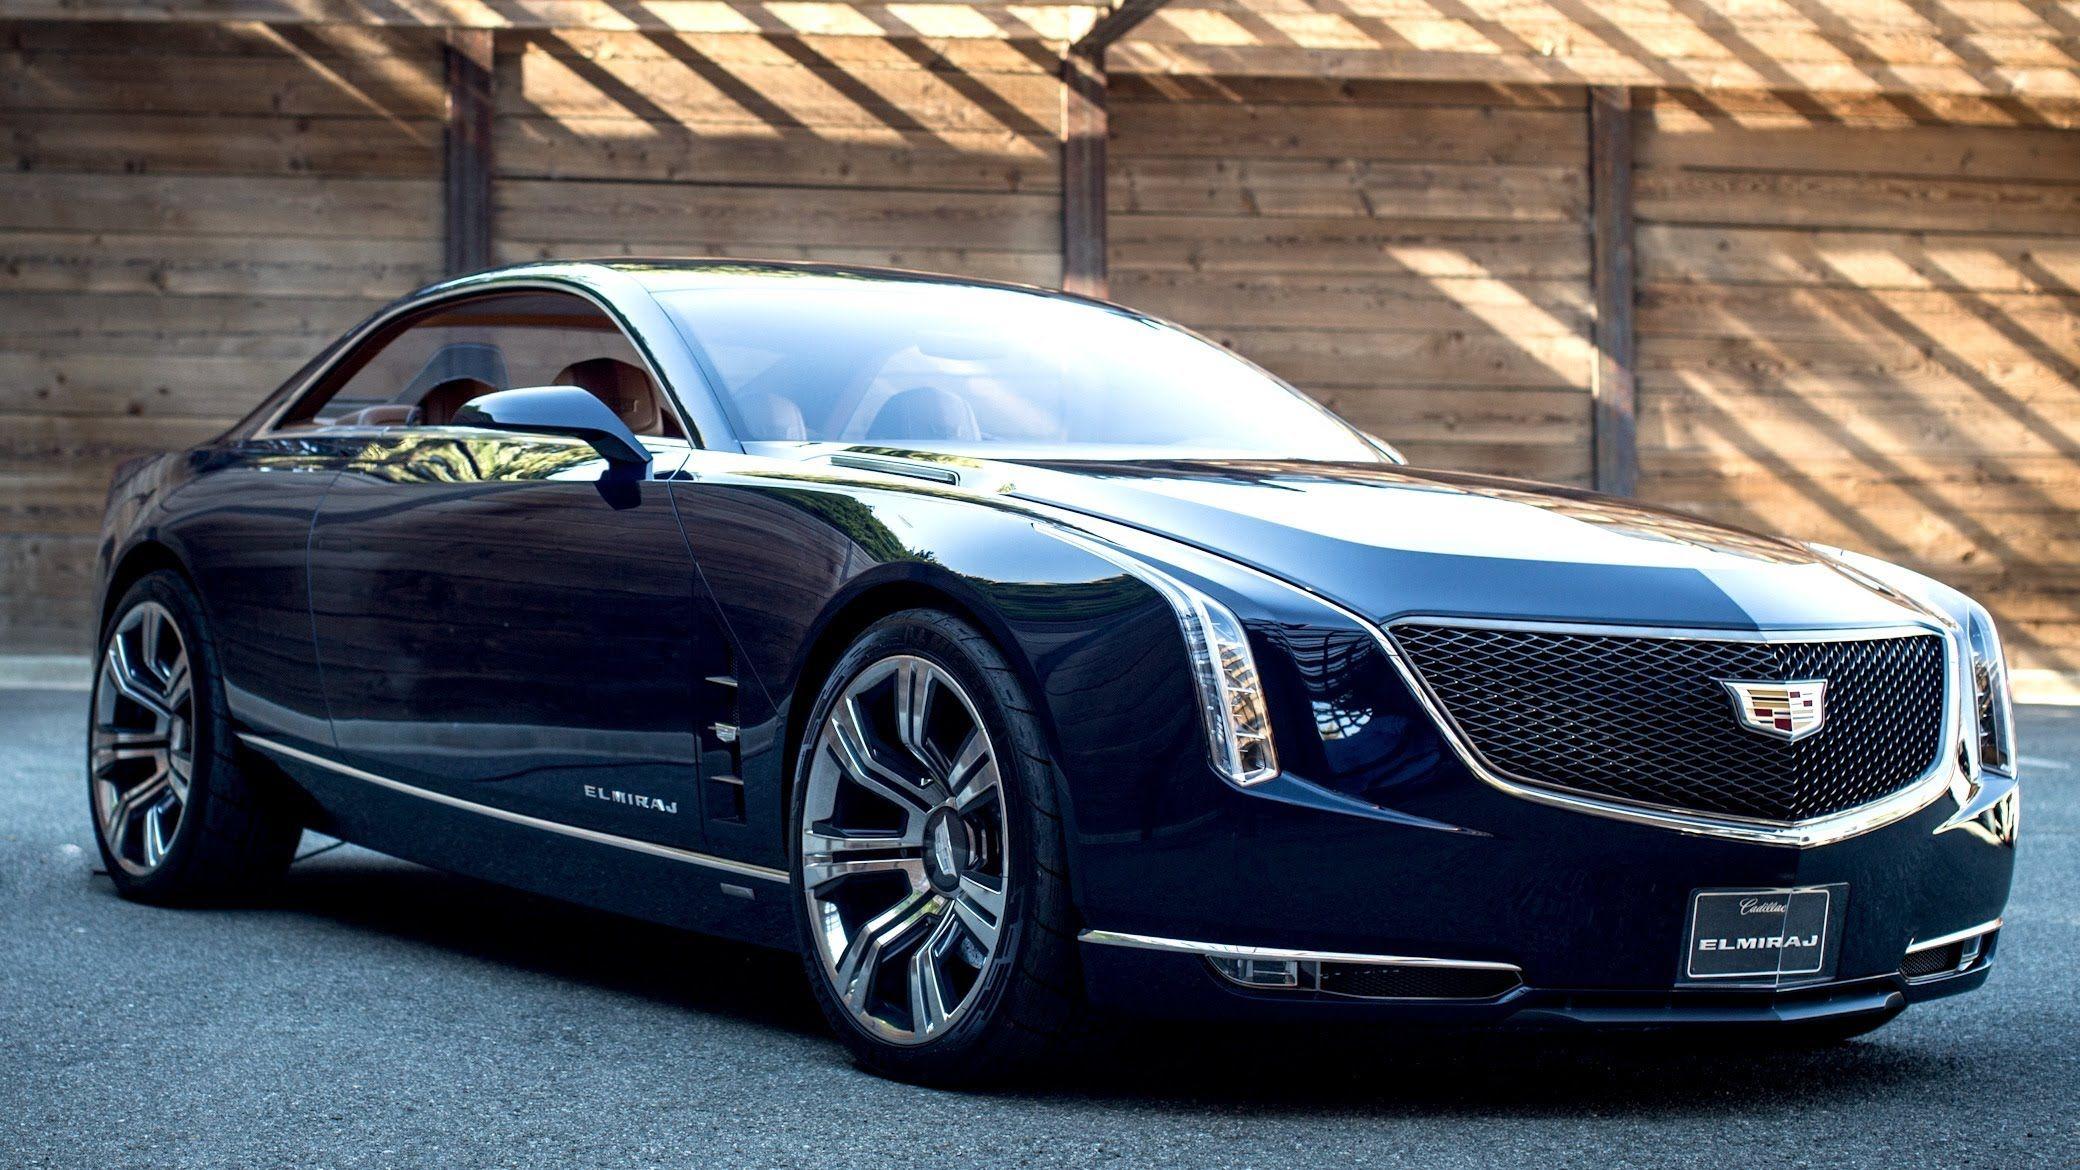 Cadillac Elmiraj Concept Jay Leno s Garage for him for mi